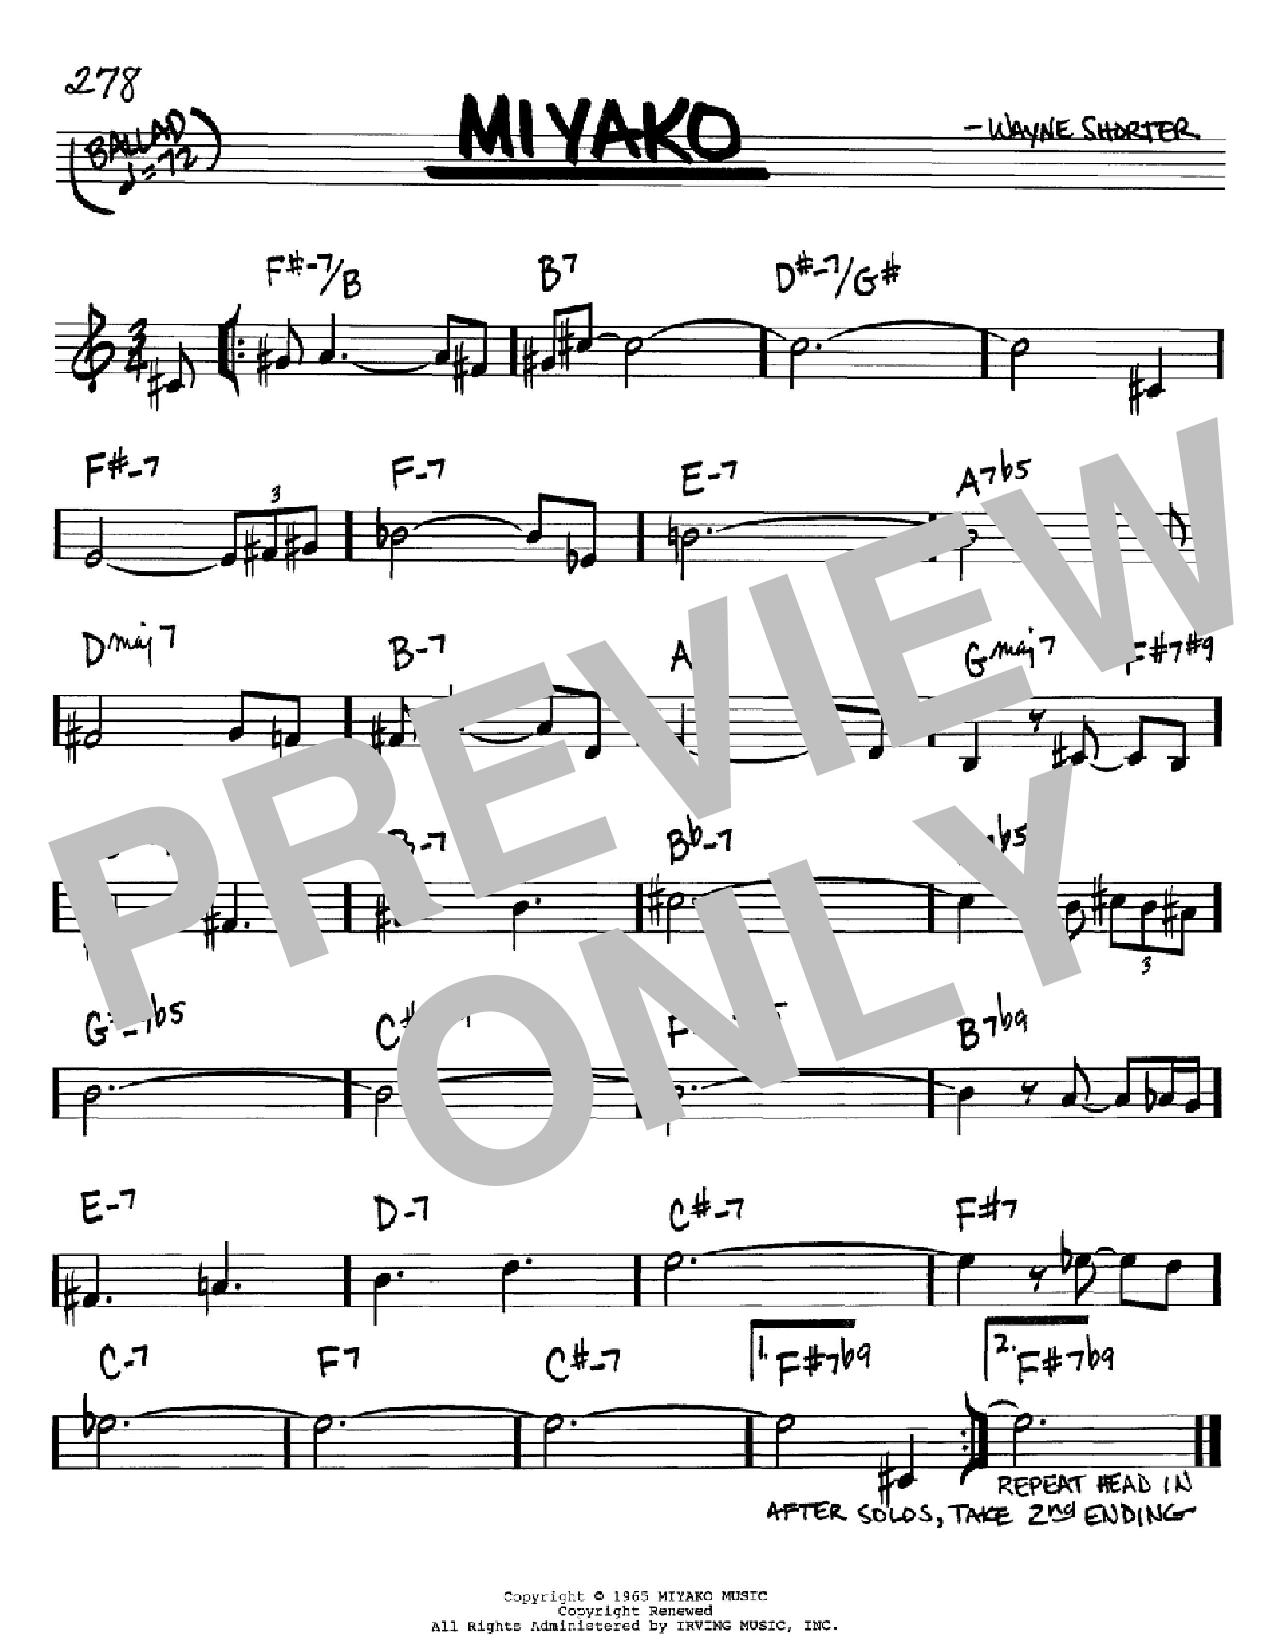 Partition autre Miyako de Wayne Shorter - Real Book, Melodie et Accords, Inst. En Sib